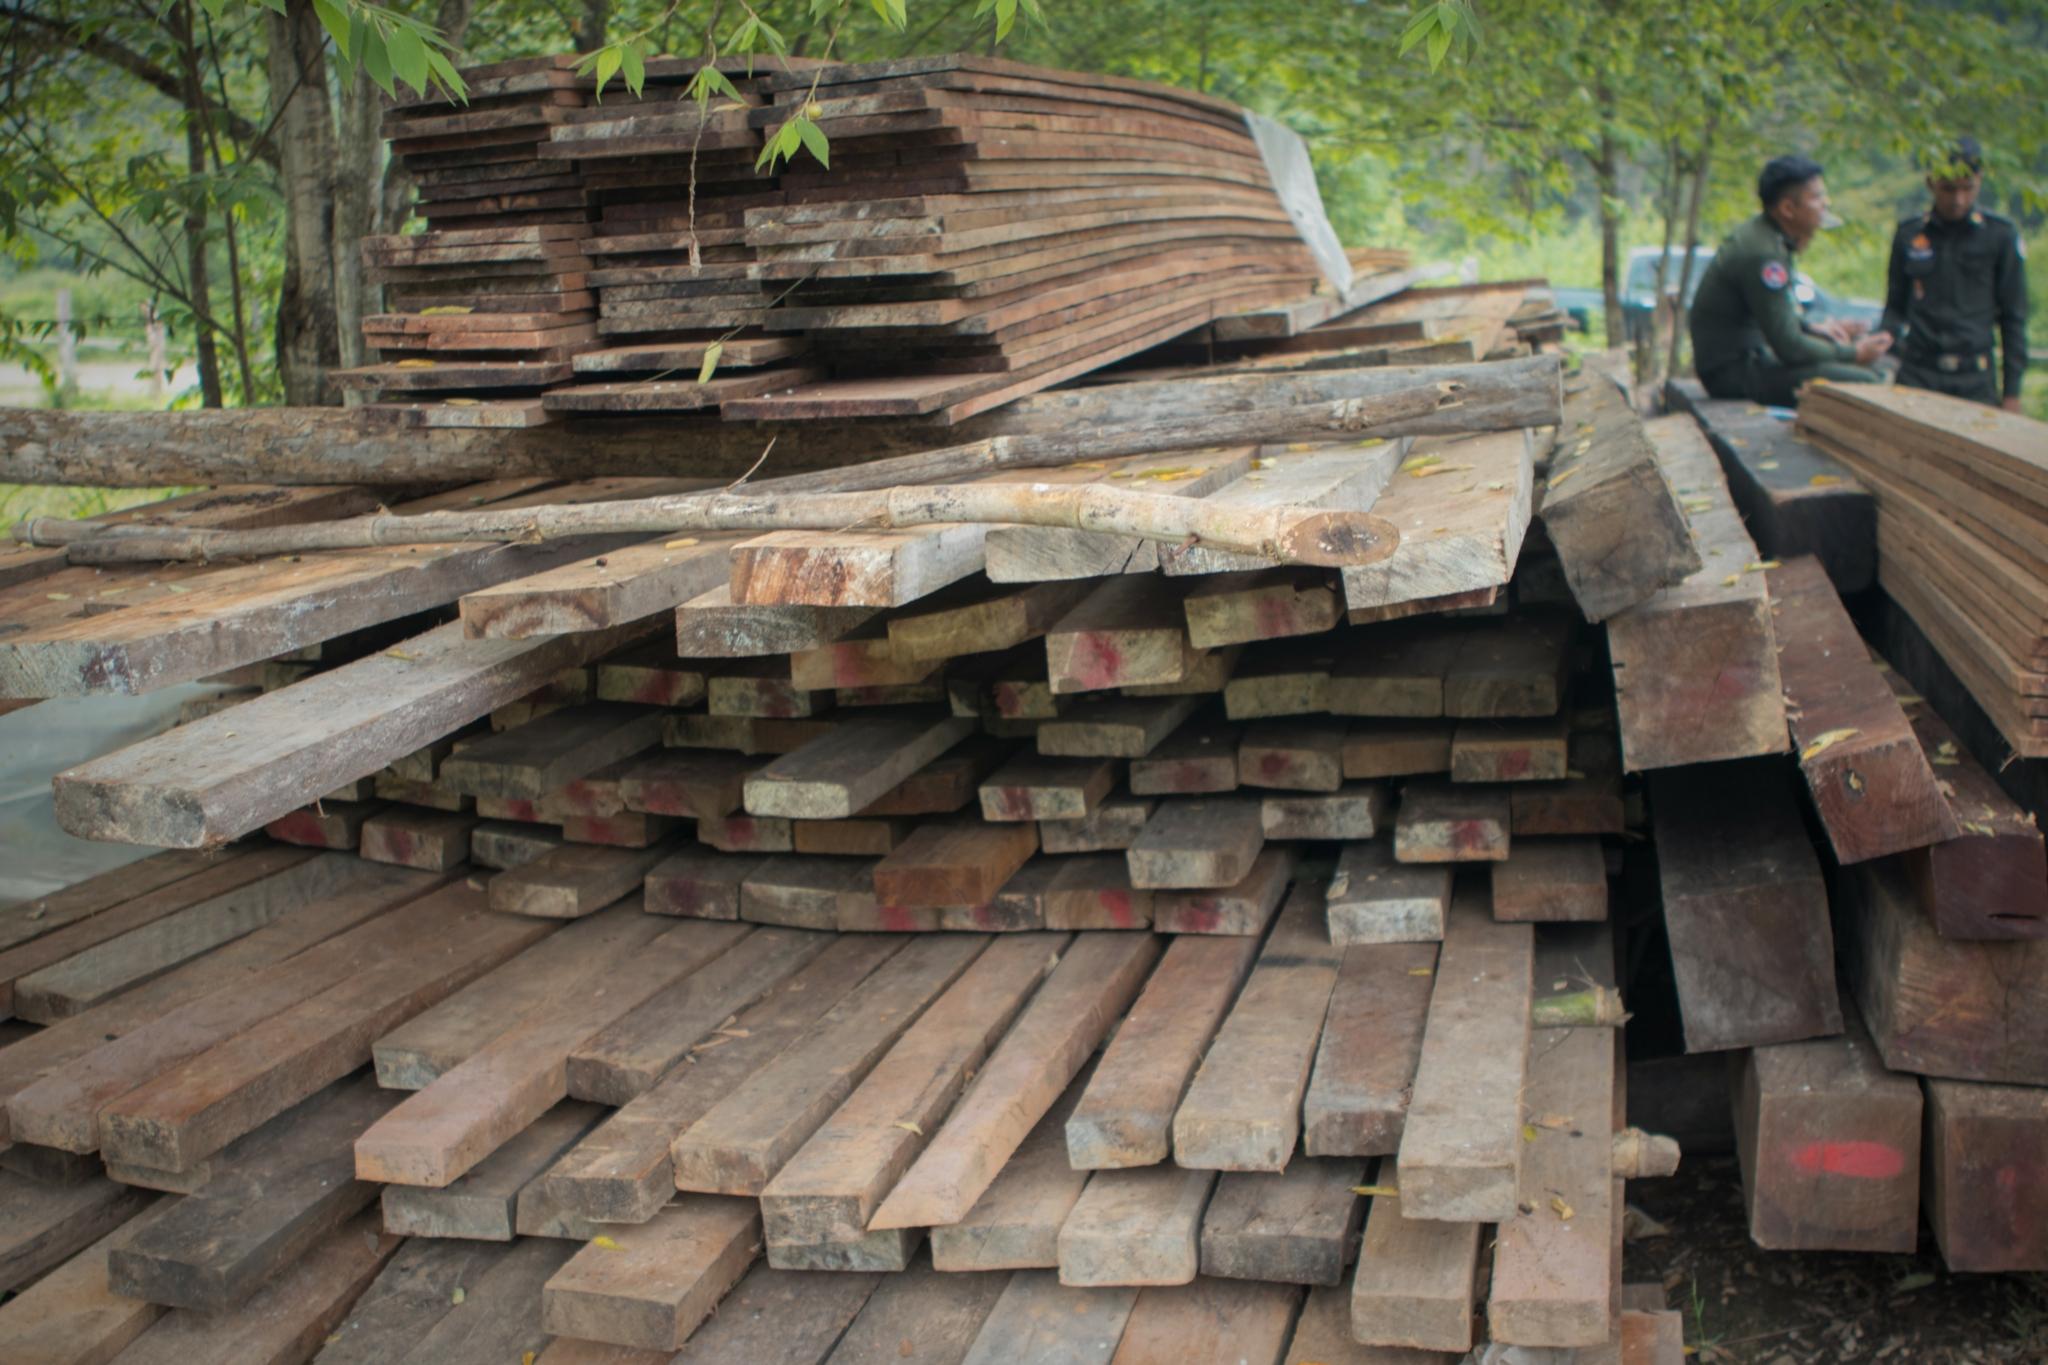 Construction timber stock